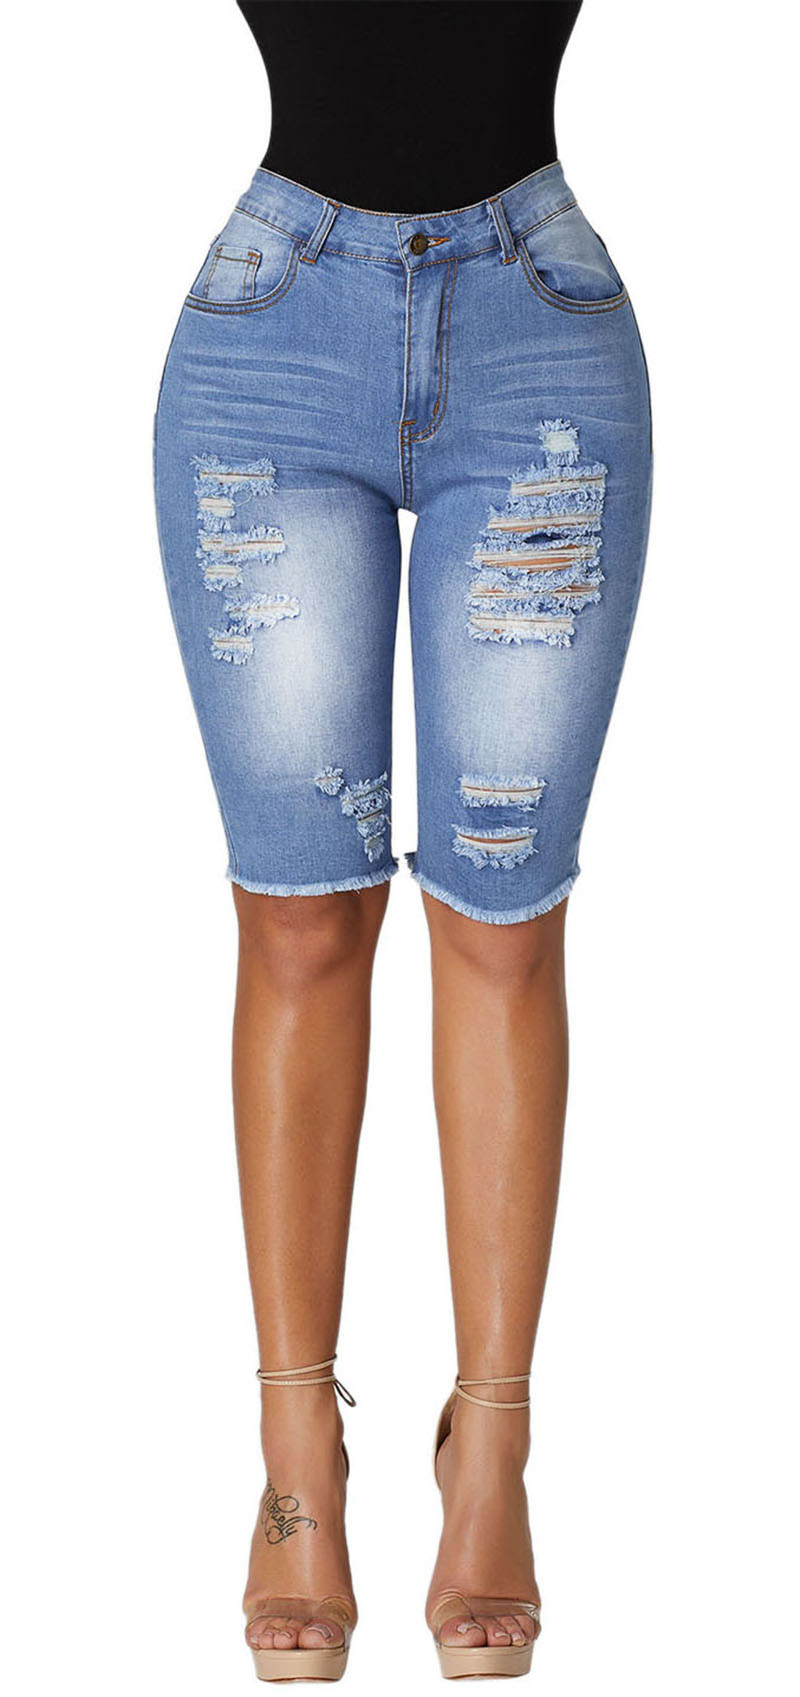 f9ec0579dfe52 2019 SEBOWEL Wash Denim Destroyed Holes Half Shorts Jeans For Woman ...